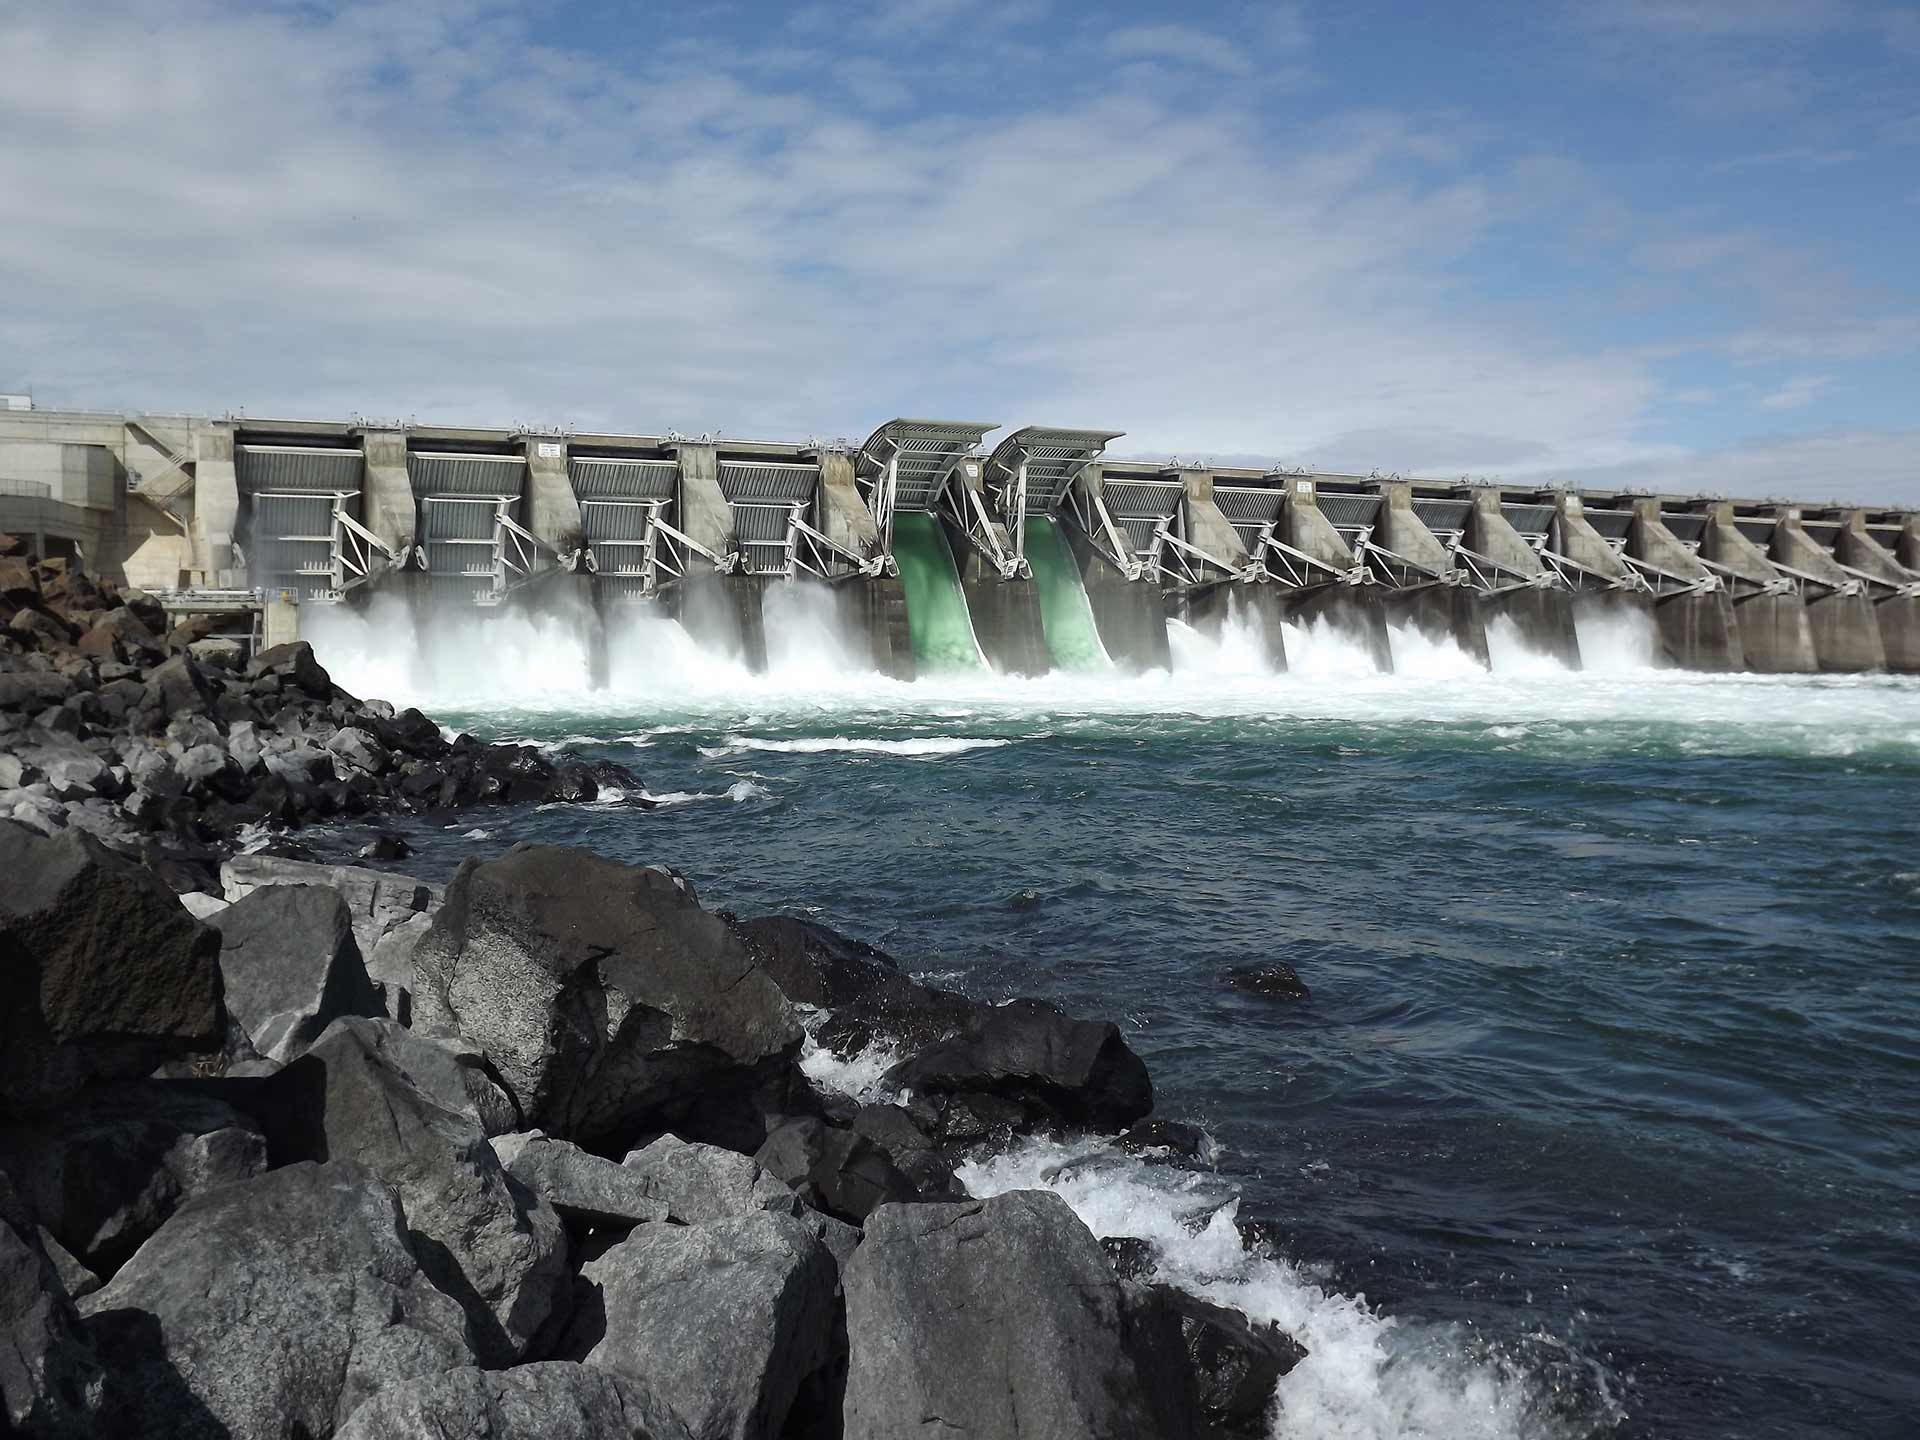 Power Generation - Hydropower